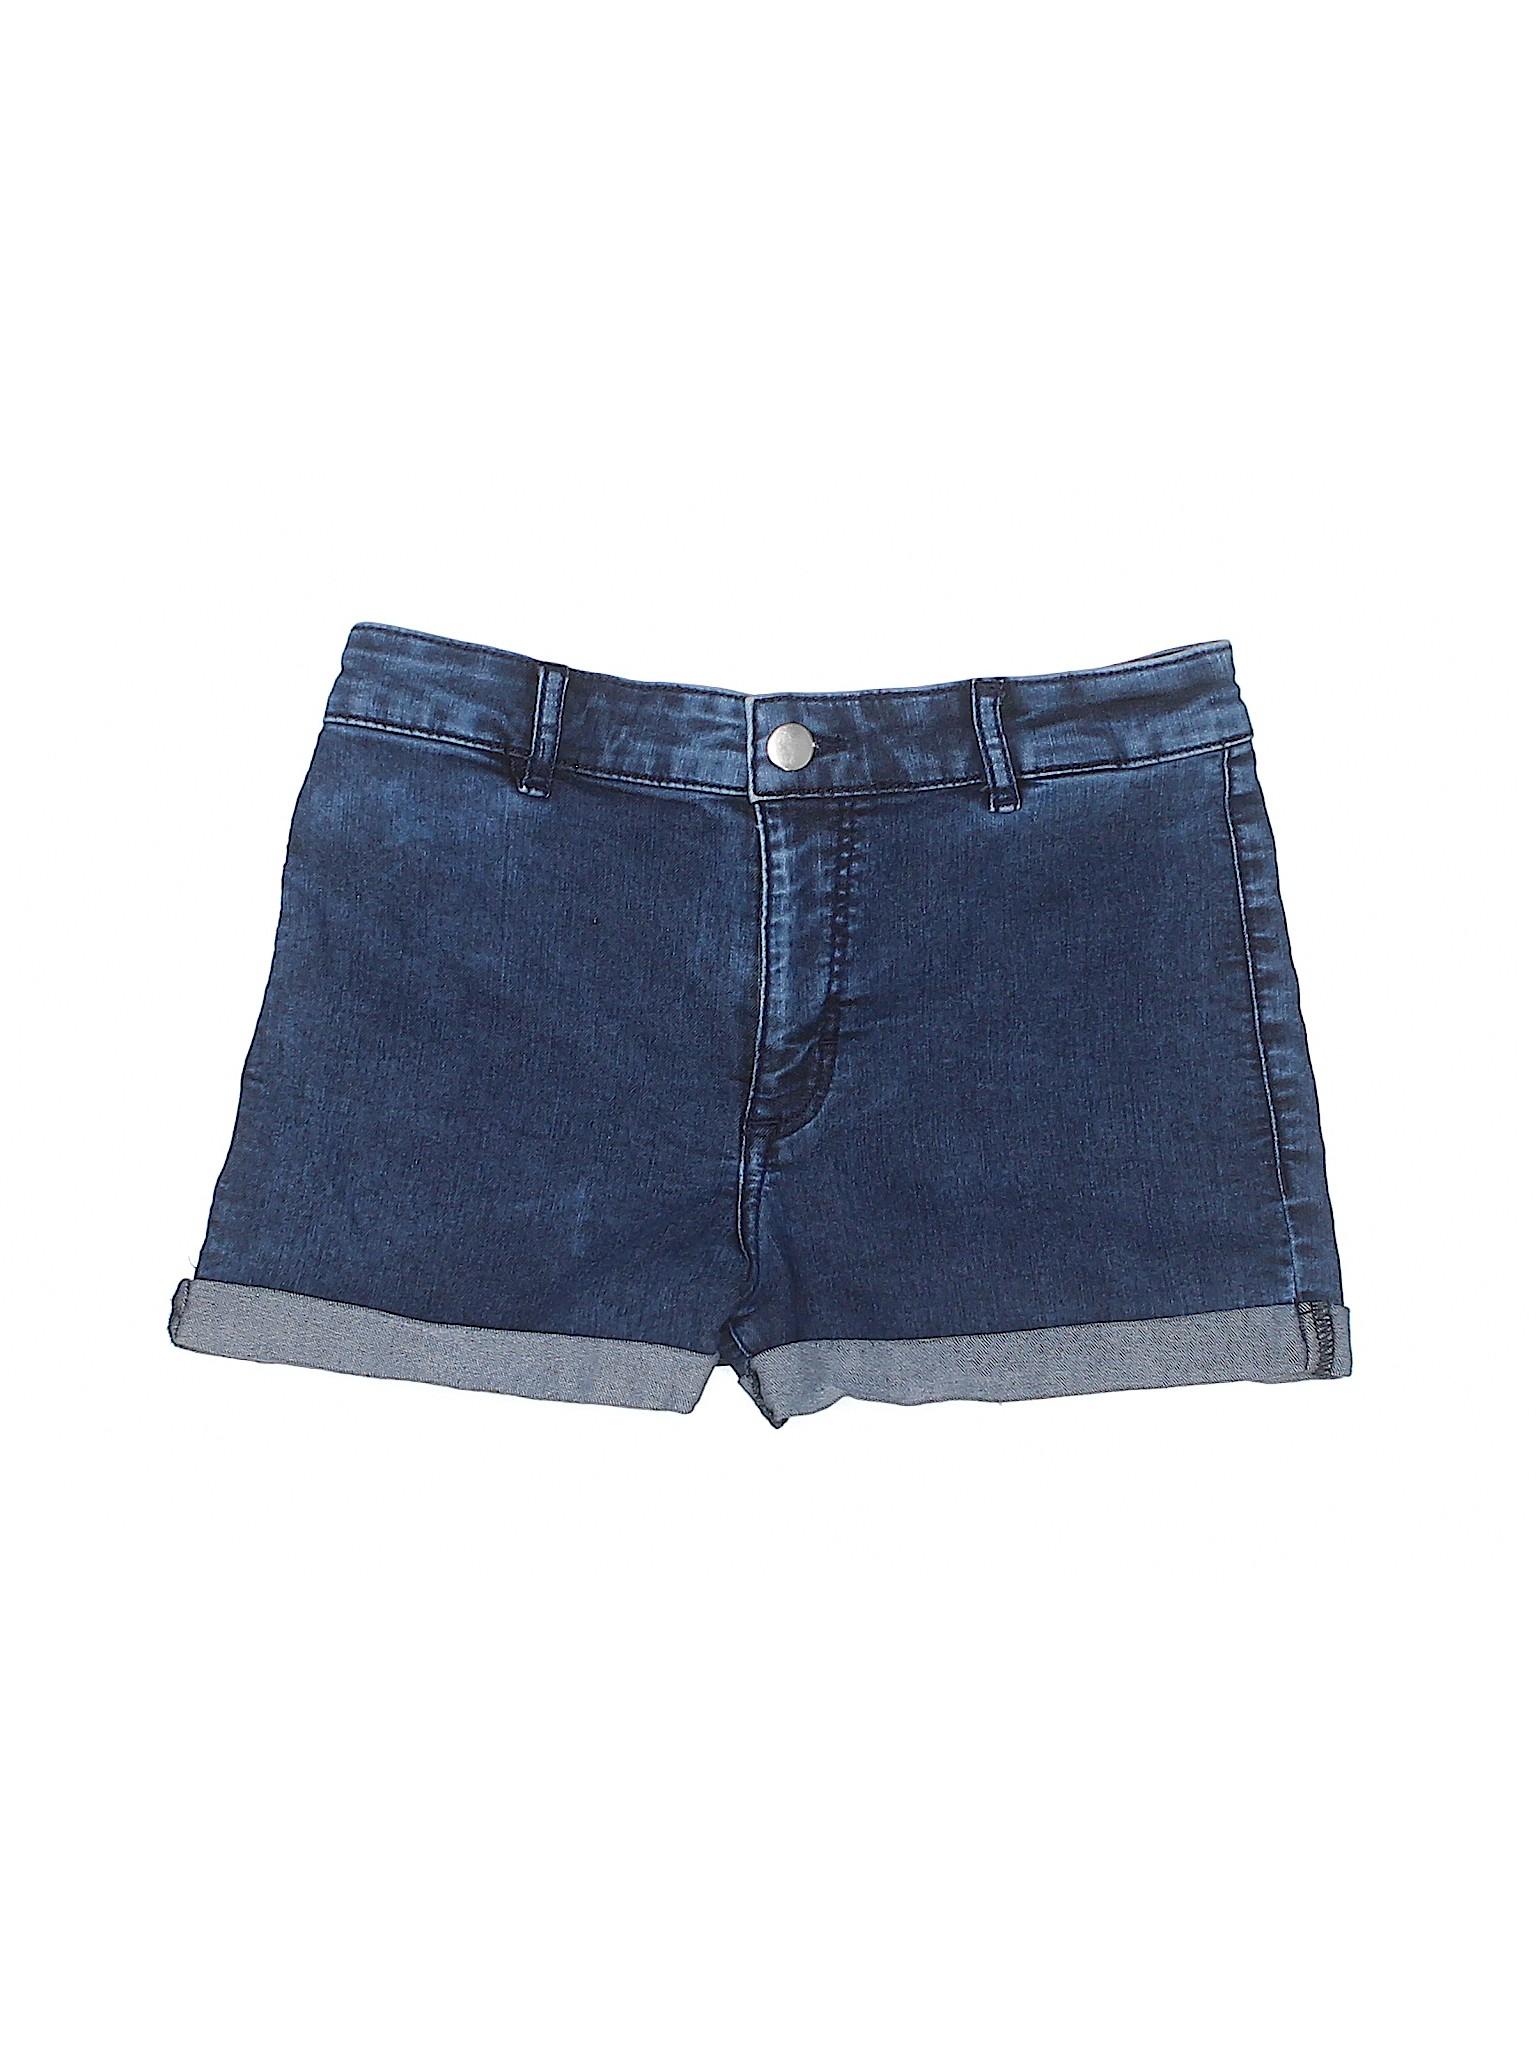 H Boutique amp;M Shorts leisure Denim 55vrTOq1